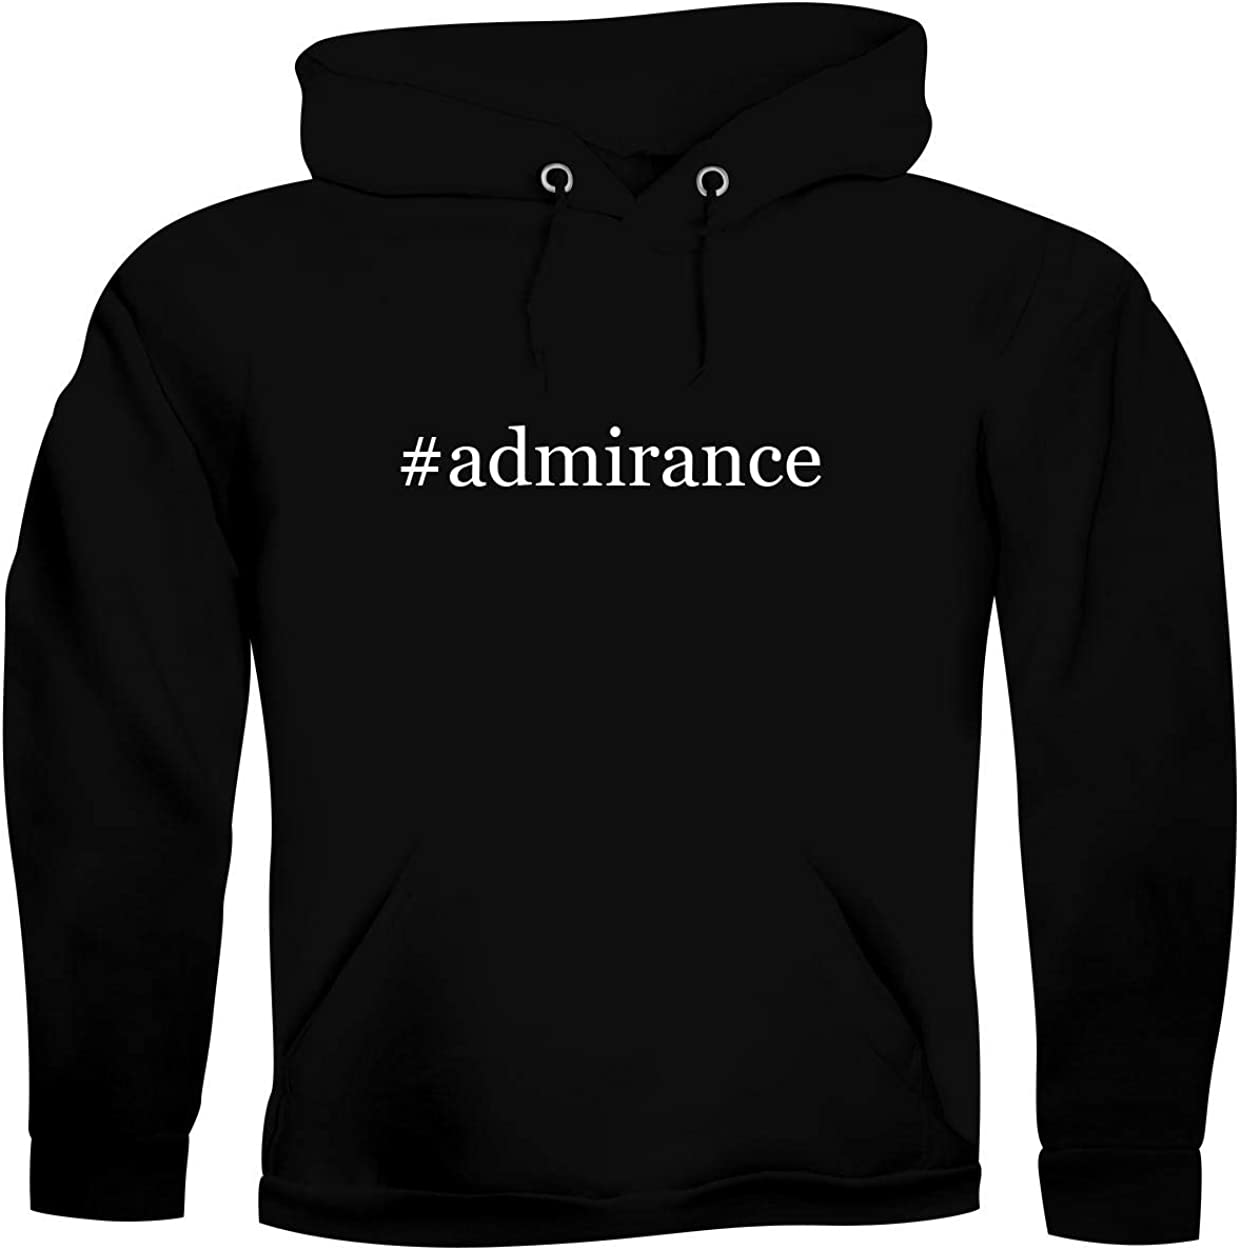 #admirance - Men's Hashtag Ultra Soft Hoodie Sweatshirt